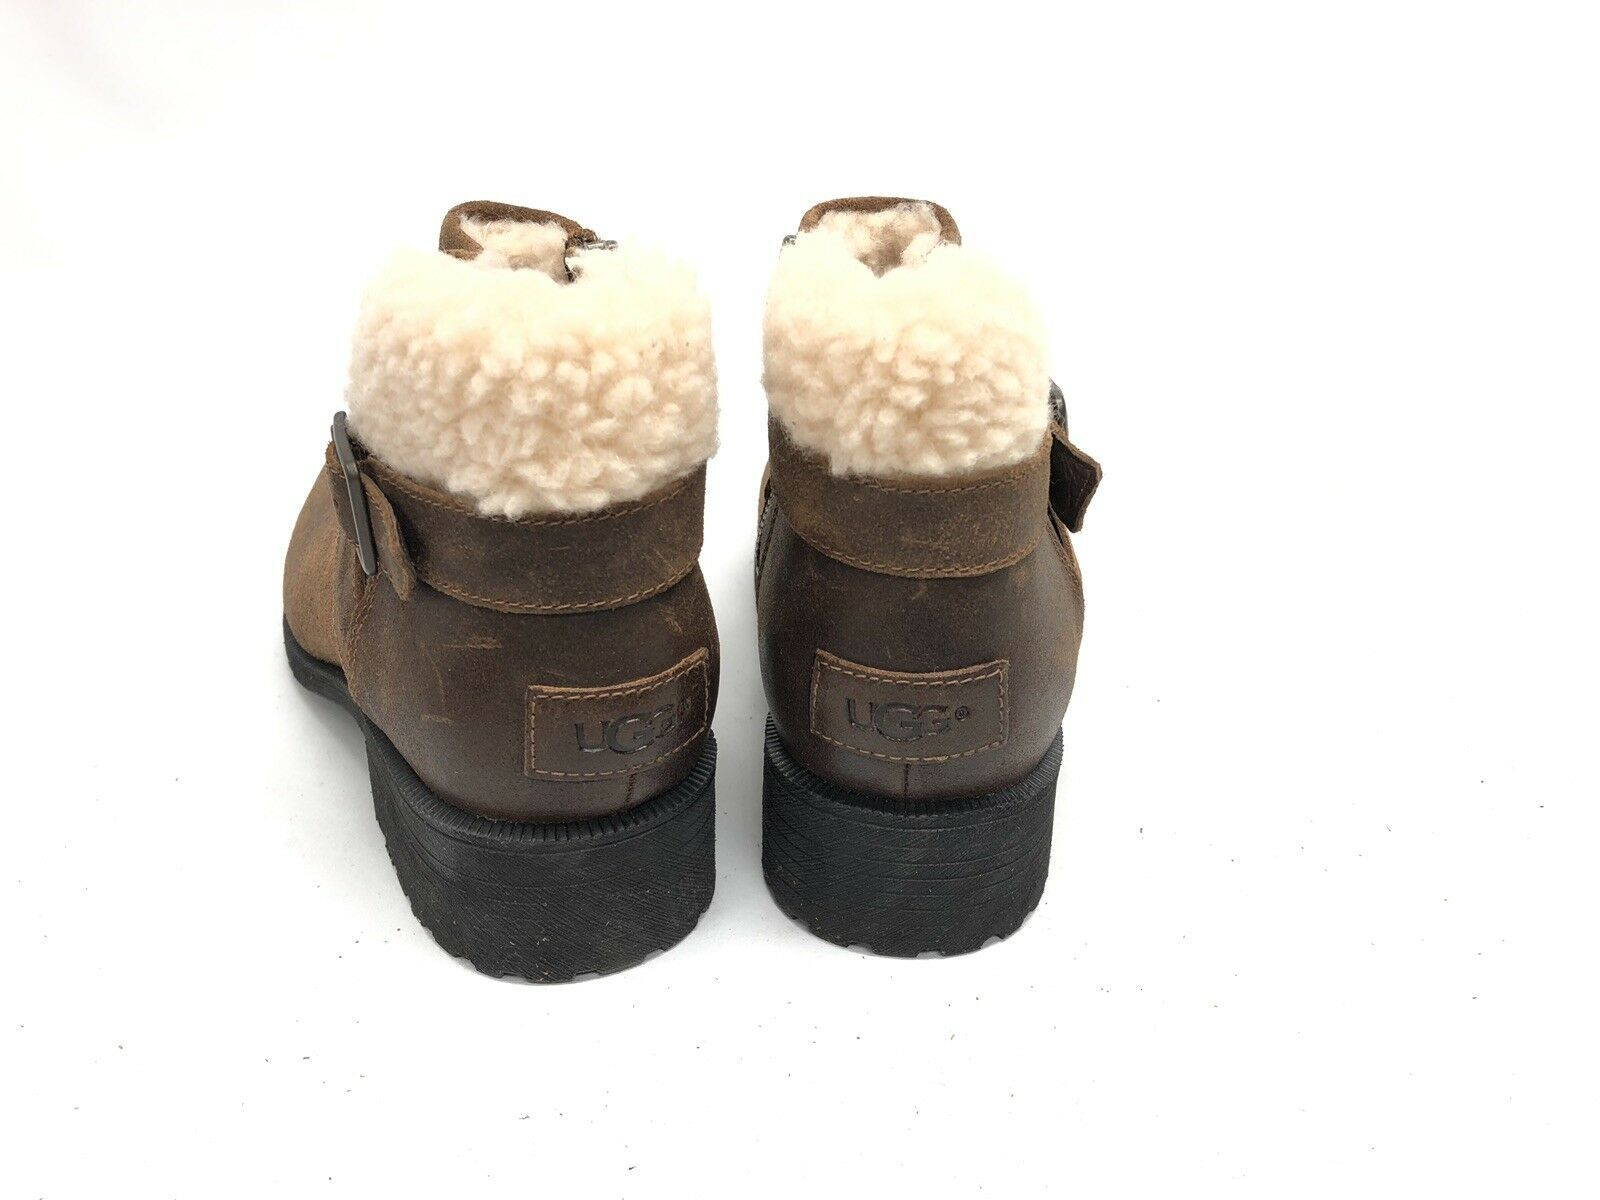 UGG Australia BENSON Buckle Sheepskin Ankle Booties 1095151 Chipmunk Waterproof image 9